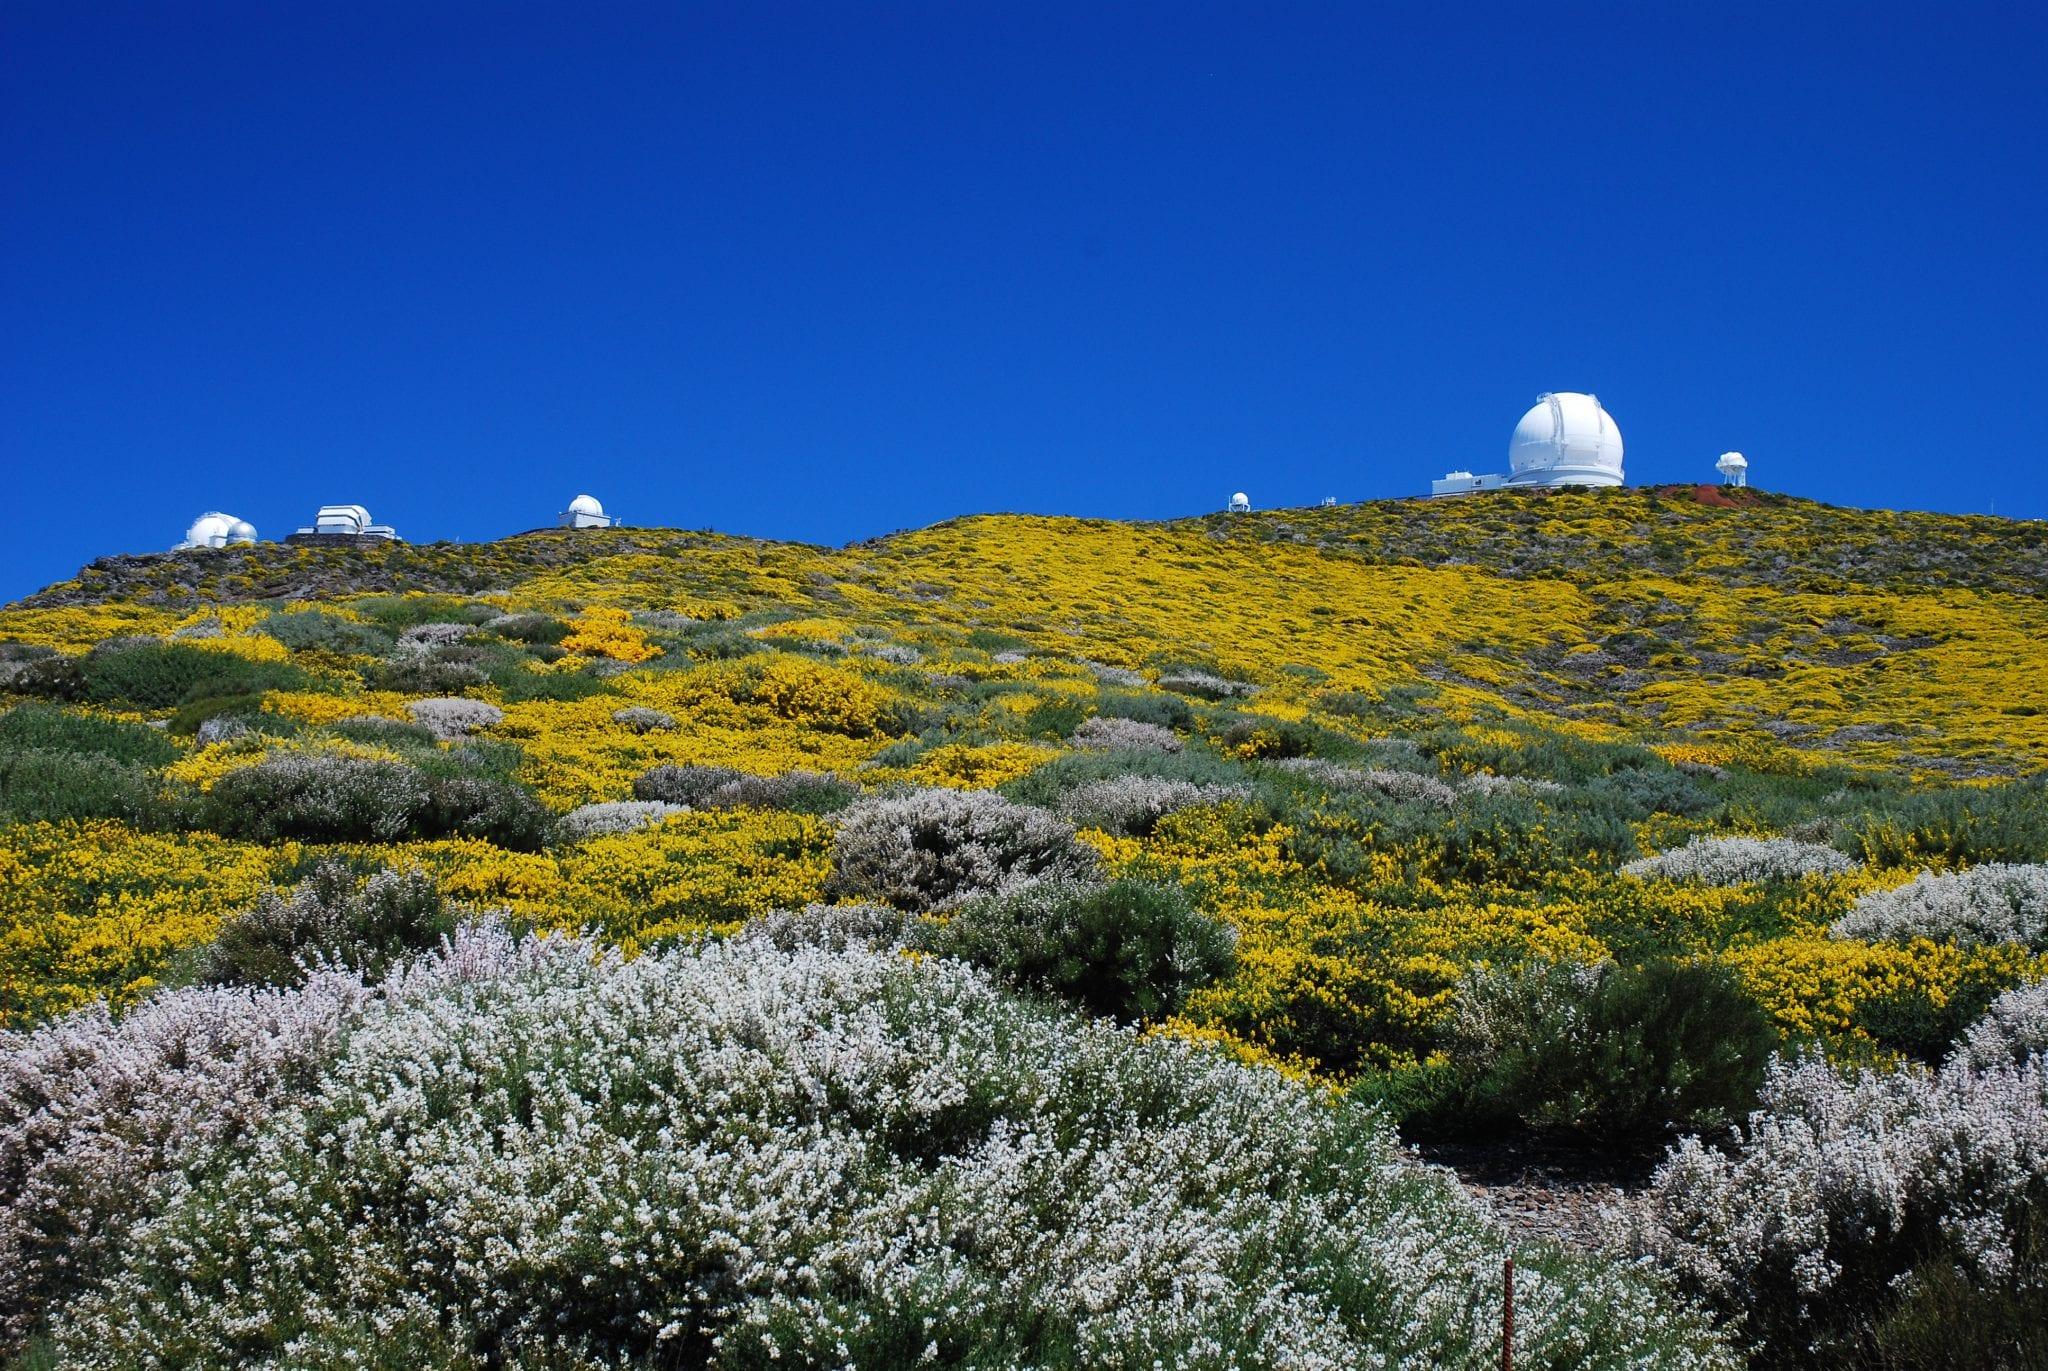 Sterrenhemel op La Palma 2